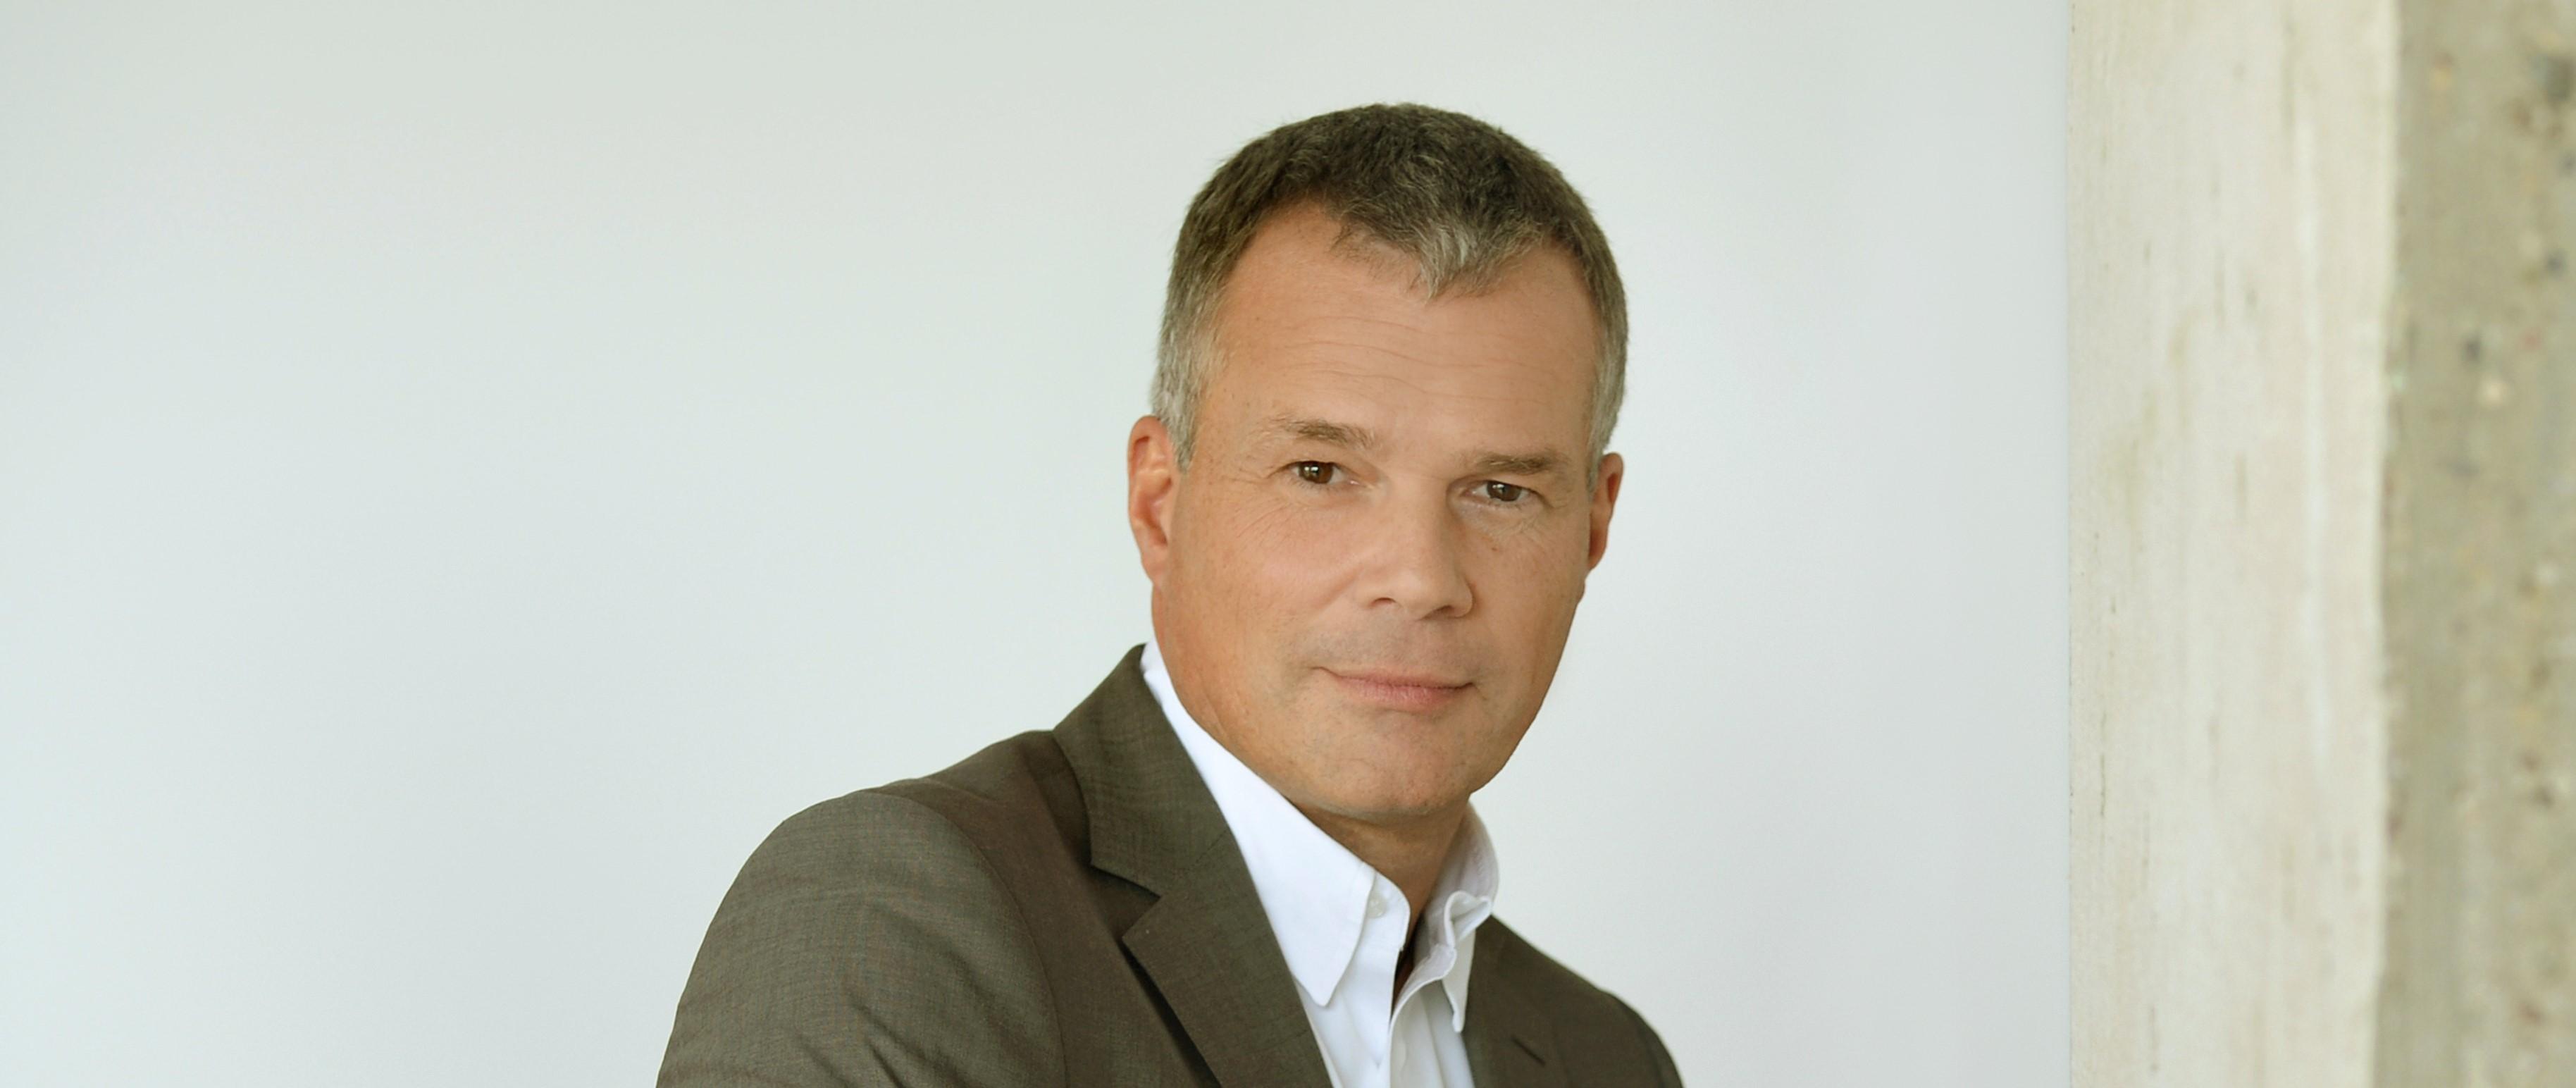 Redaktion - Jens Bernecker